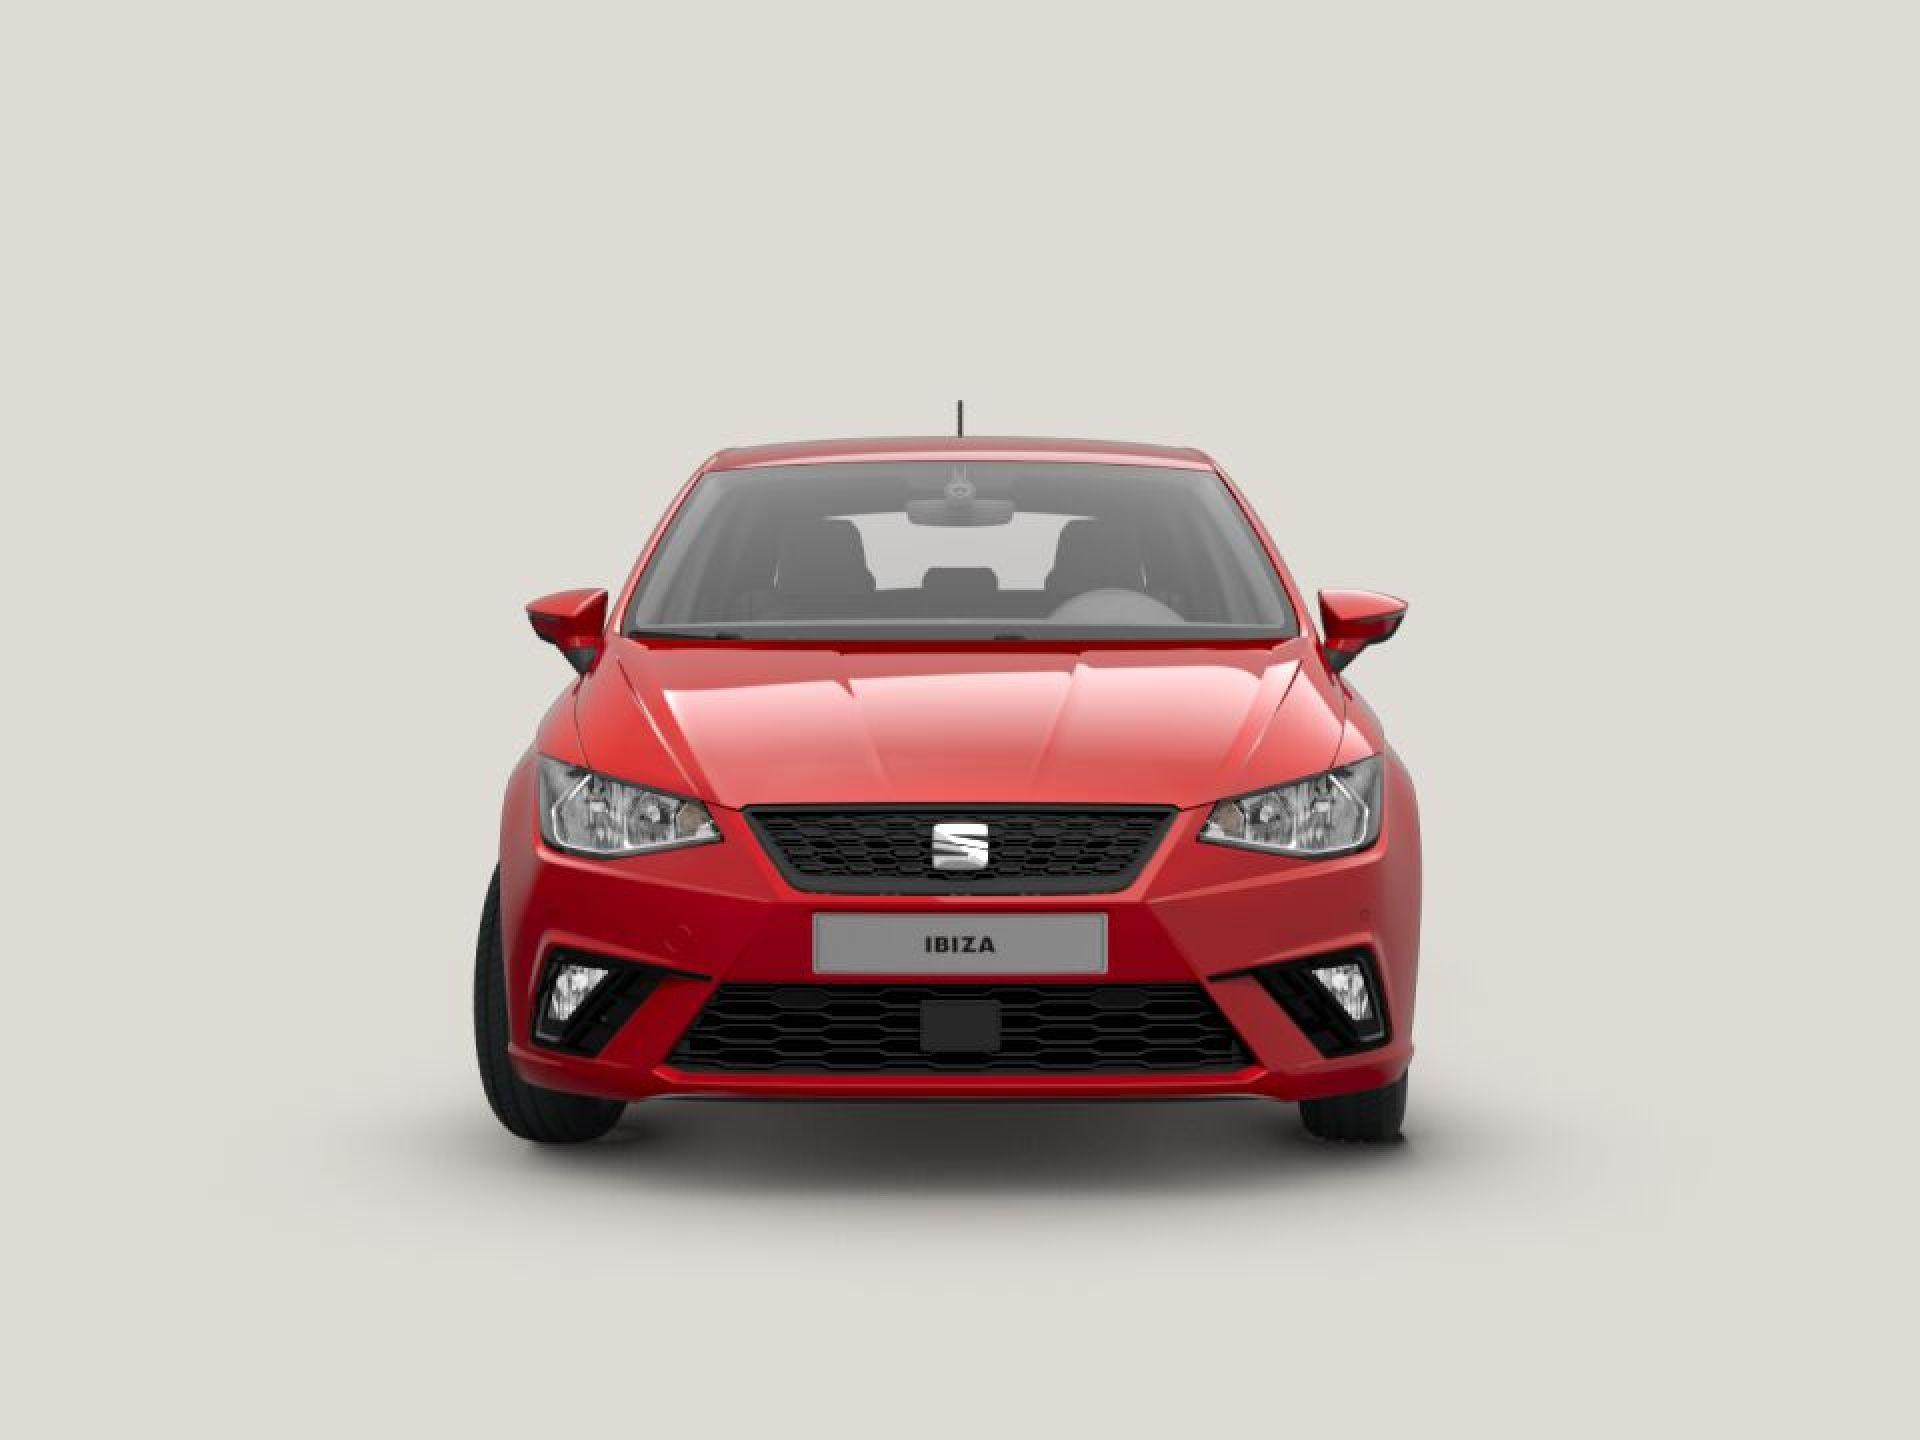 SEAT Ibiza 1.0 TSI 70kW (95CV) Style Go nuevo Madrid